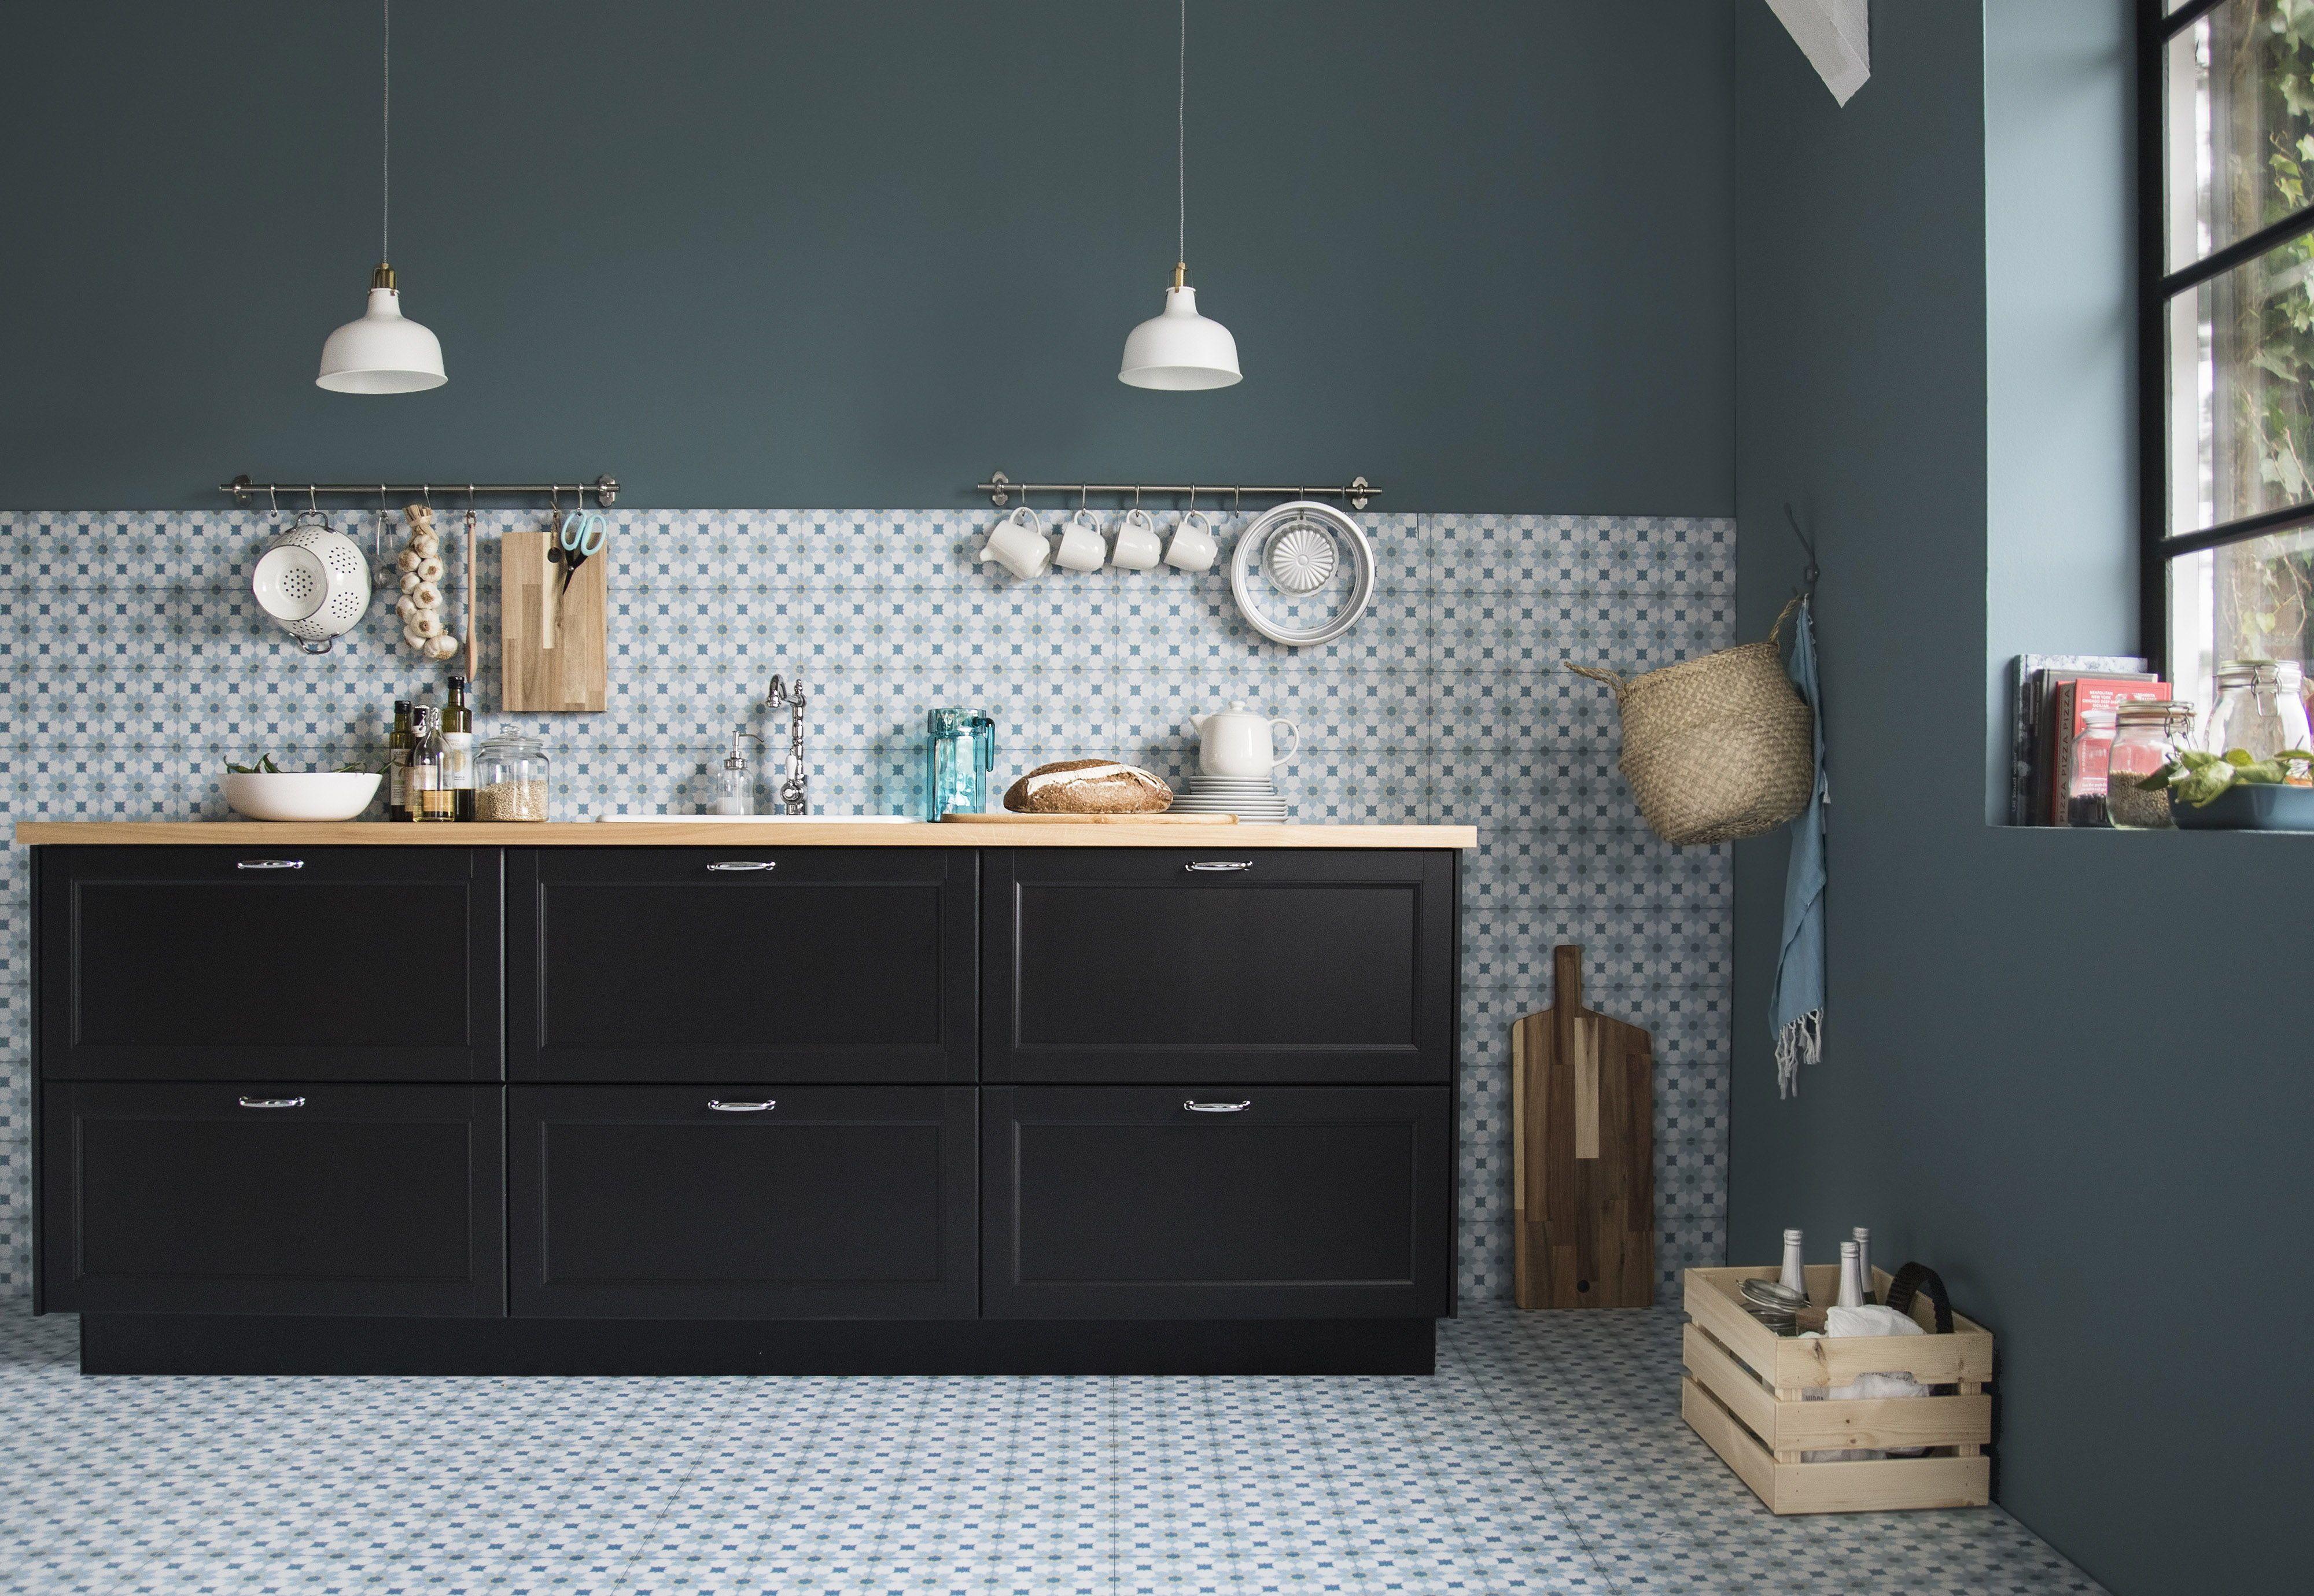 Keuken Tegels Ikea : Lerhyttan deur zwart gelazuurd ikea kitchens